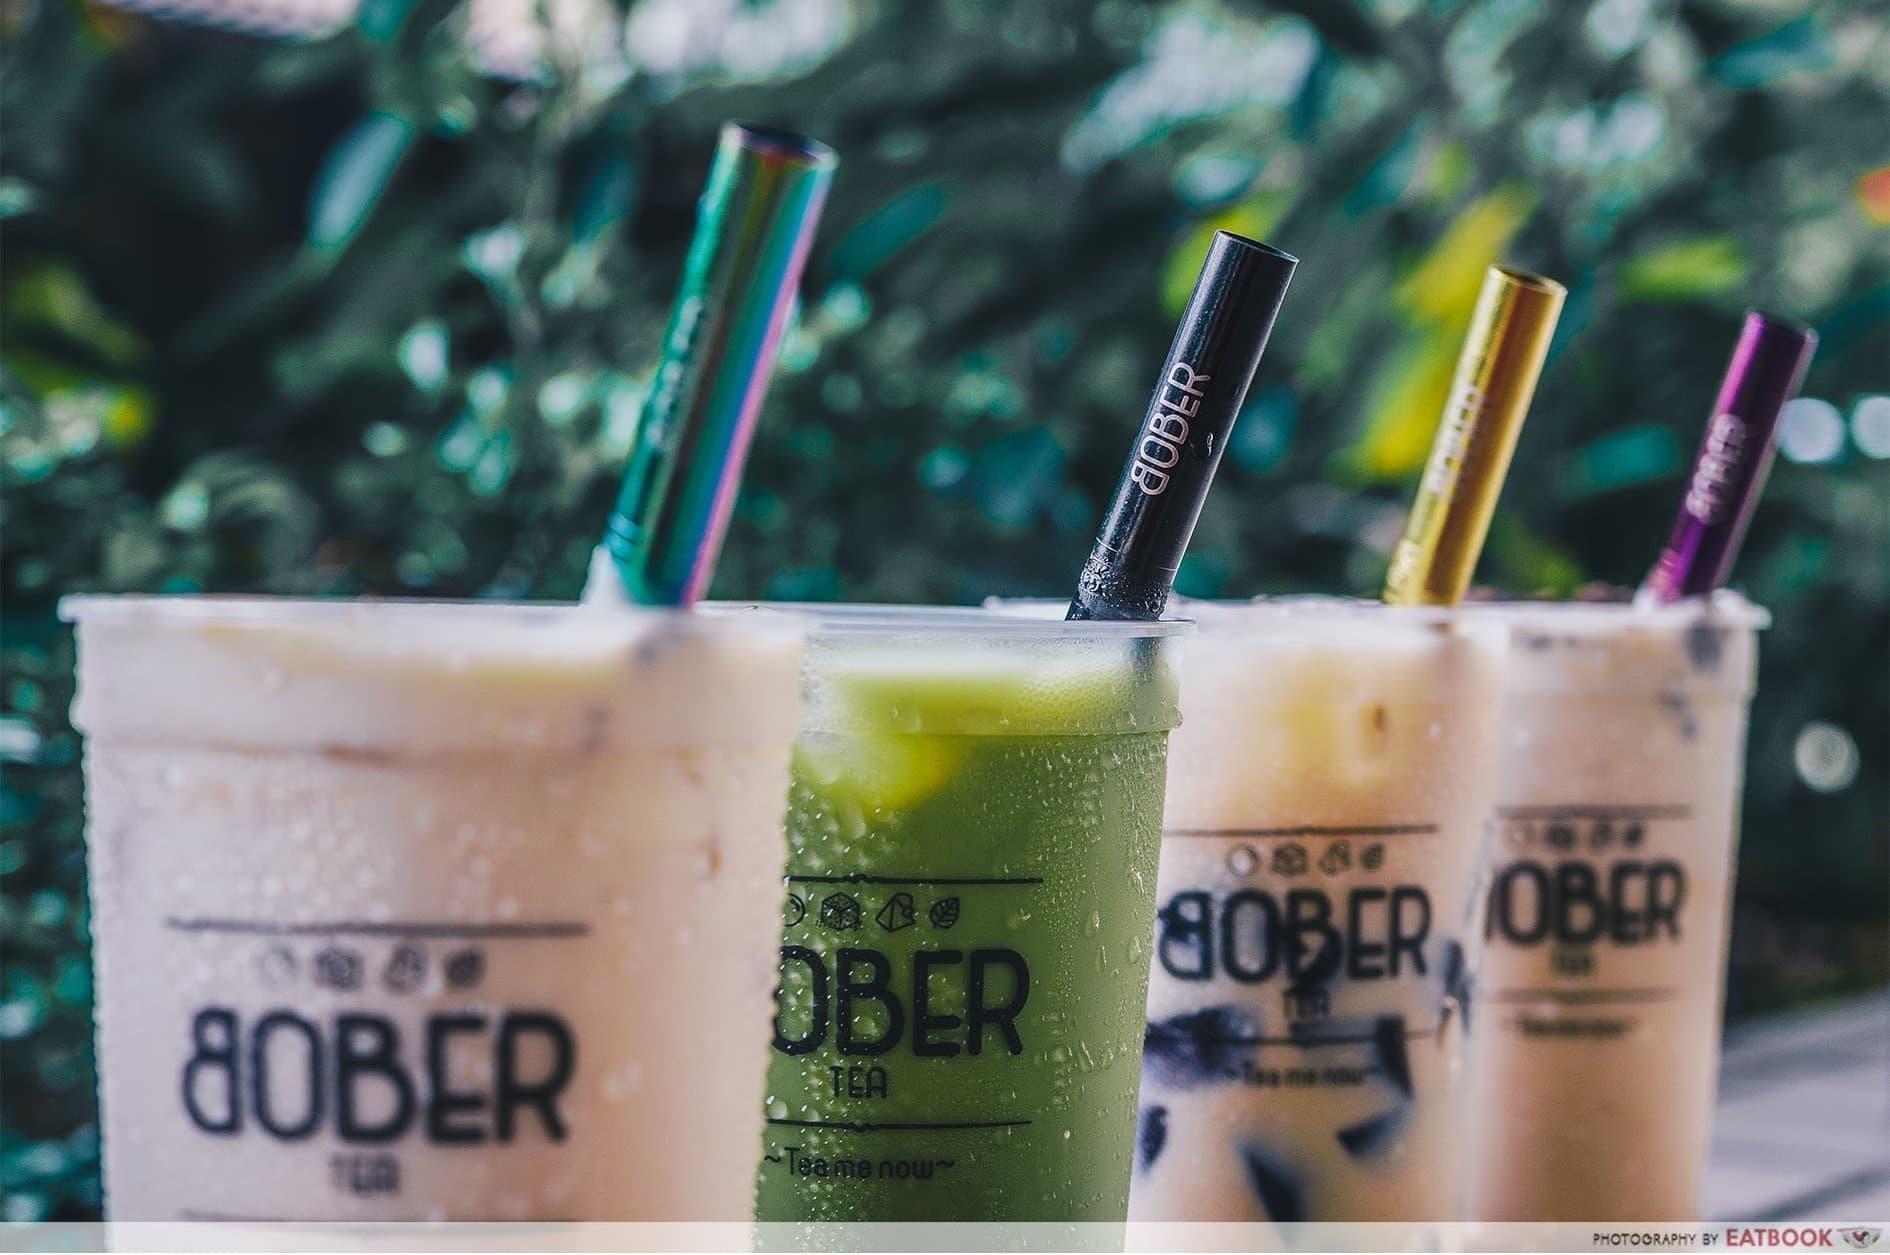 Bober Tea Delivery - Bober Tea row